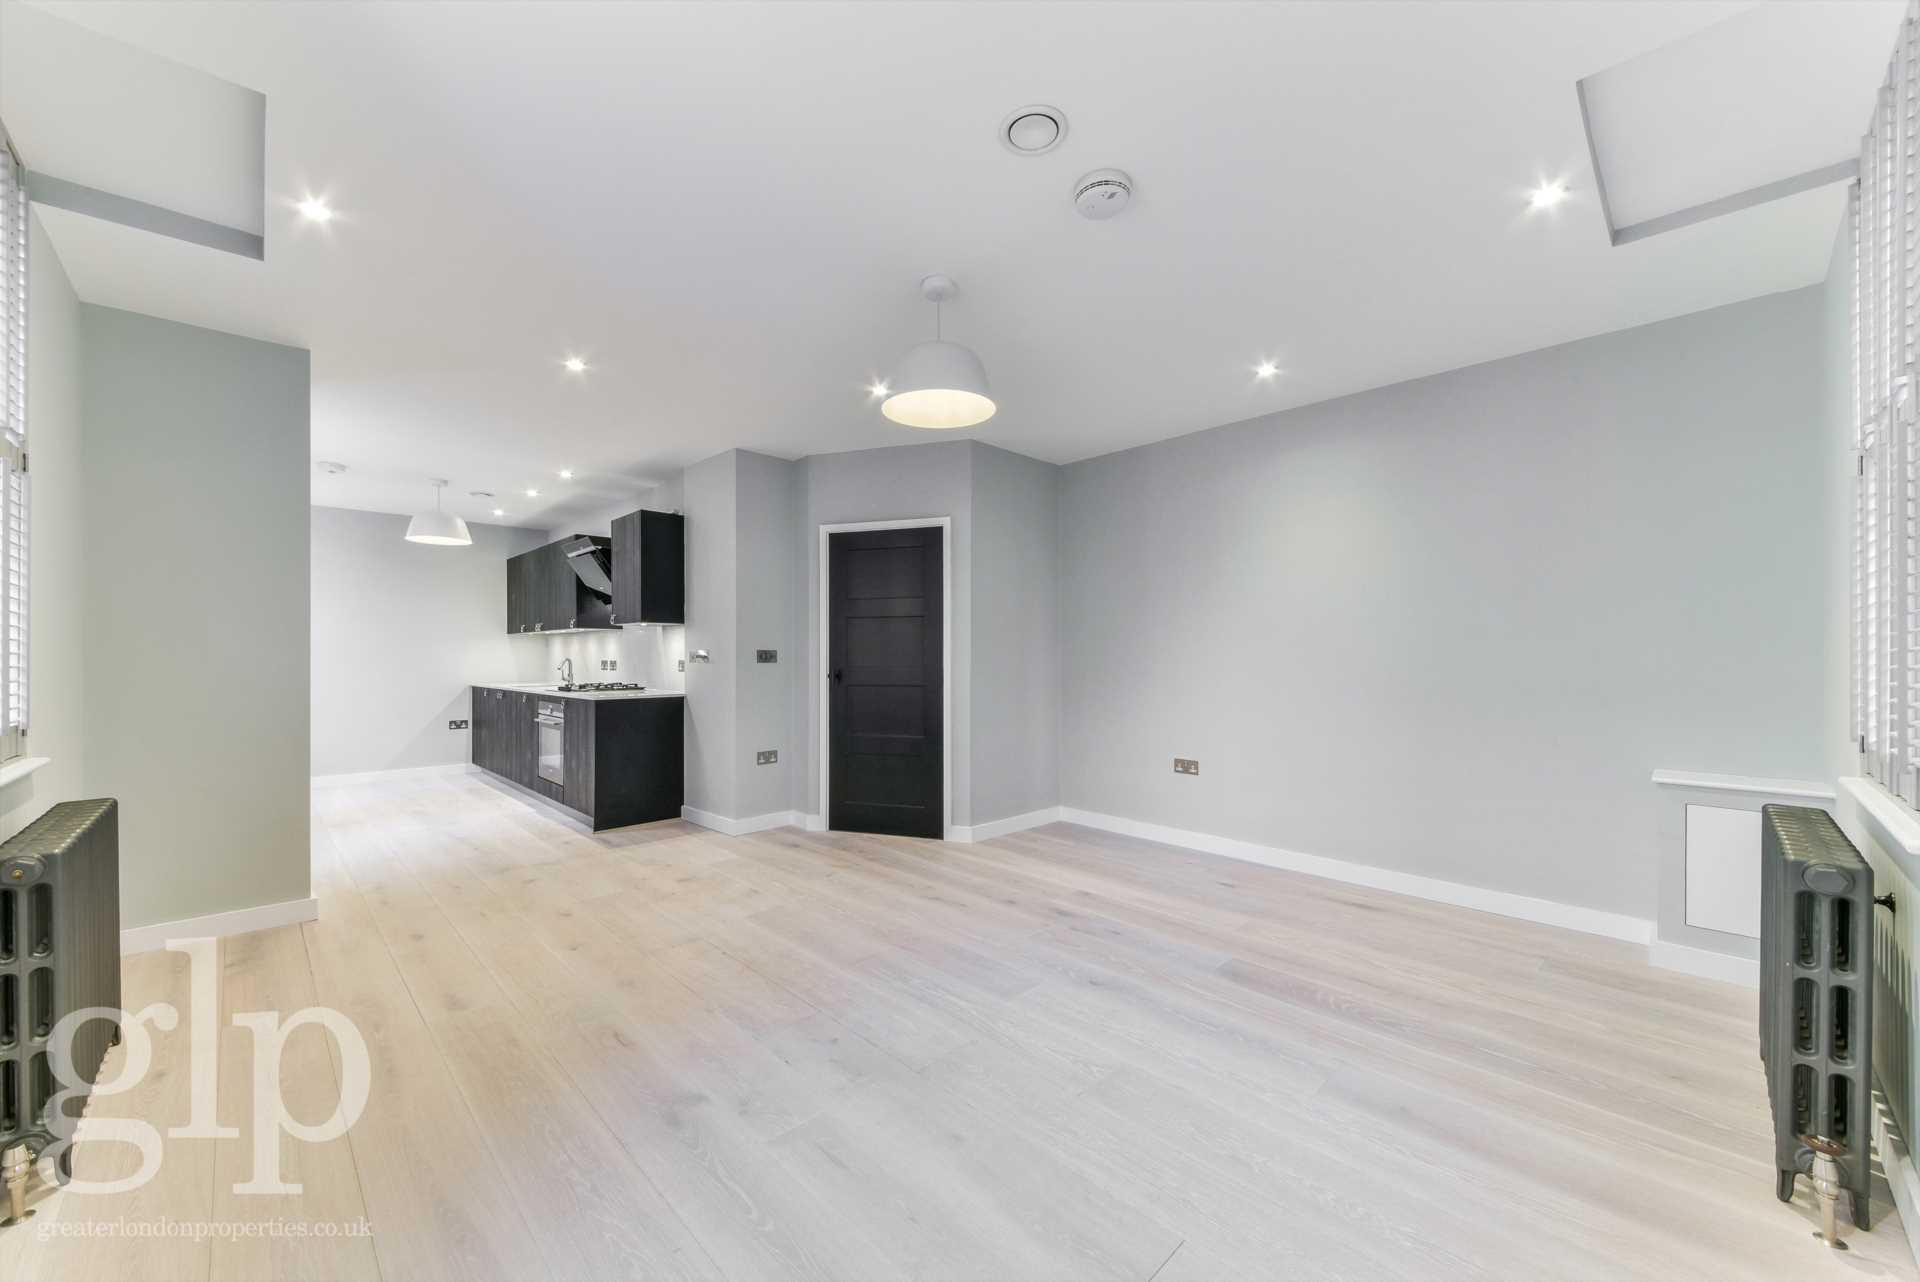 1 Bedroom Apartment To Rent Wellington Street London Wc2e 7bd